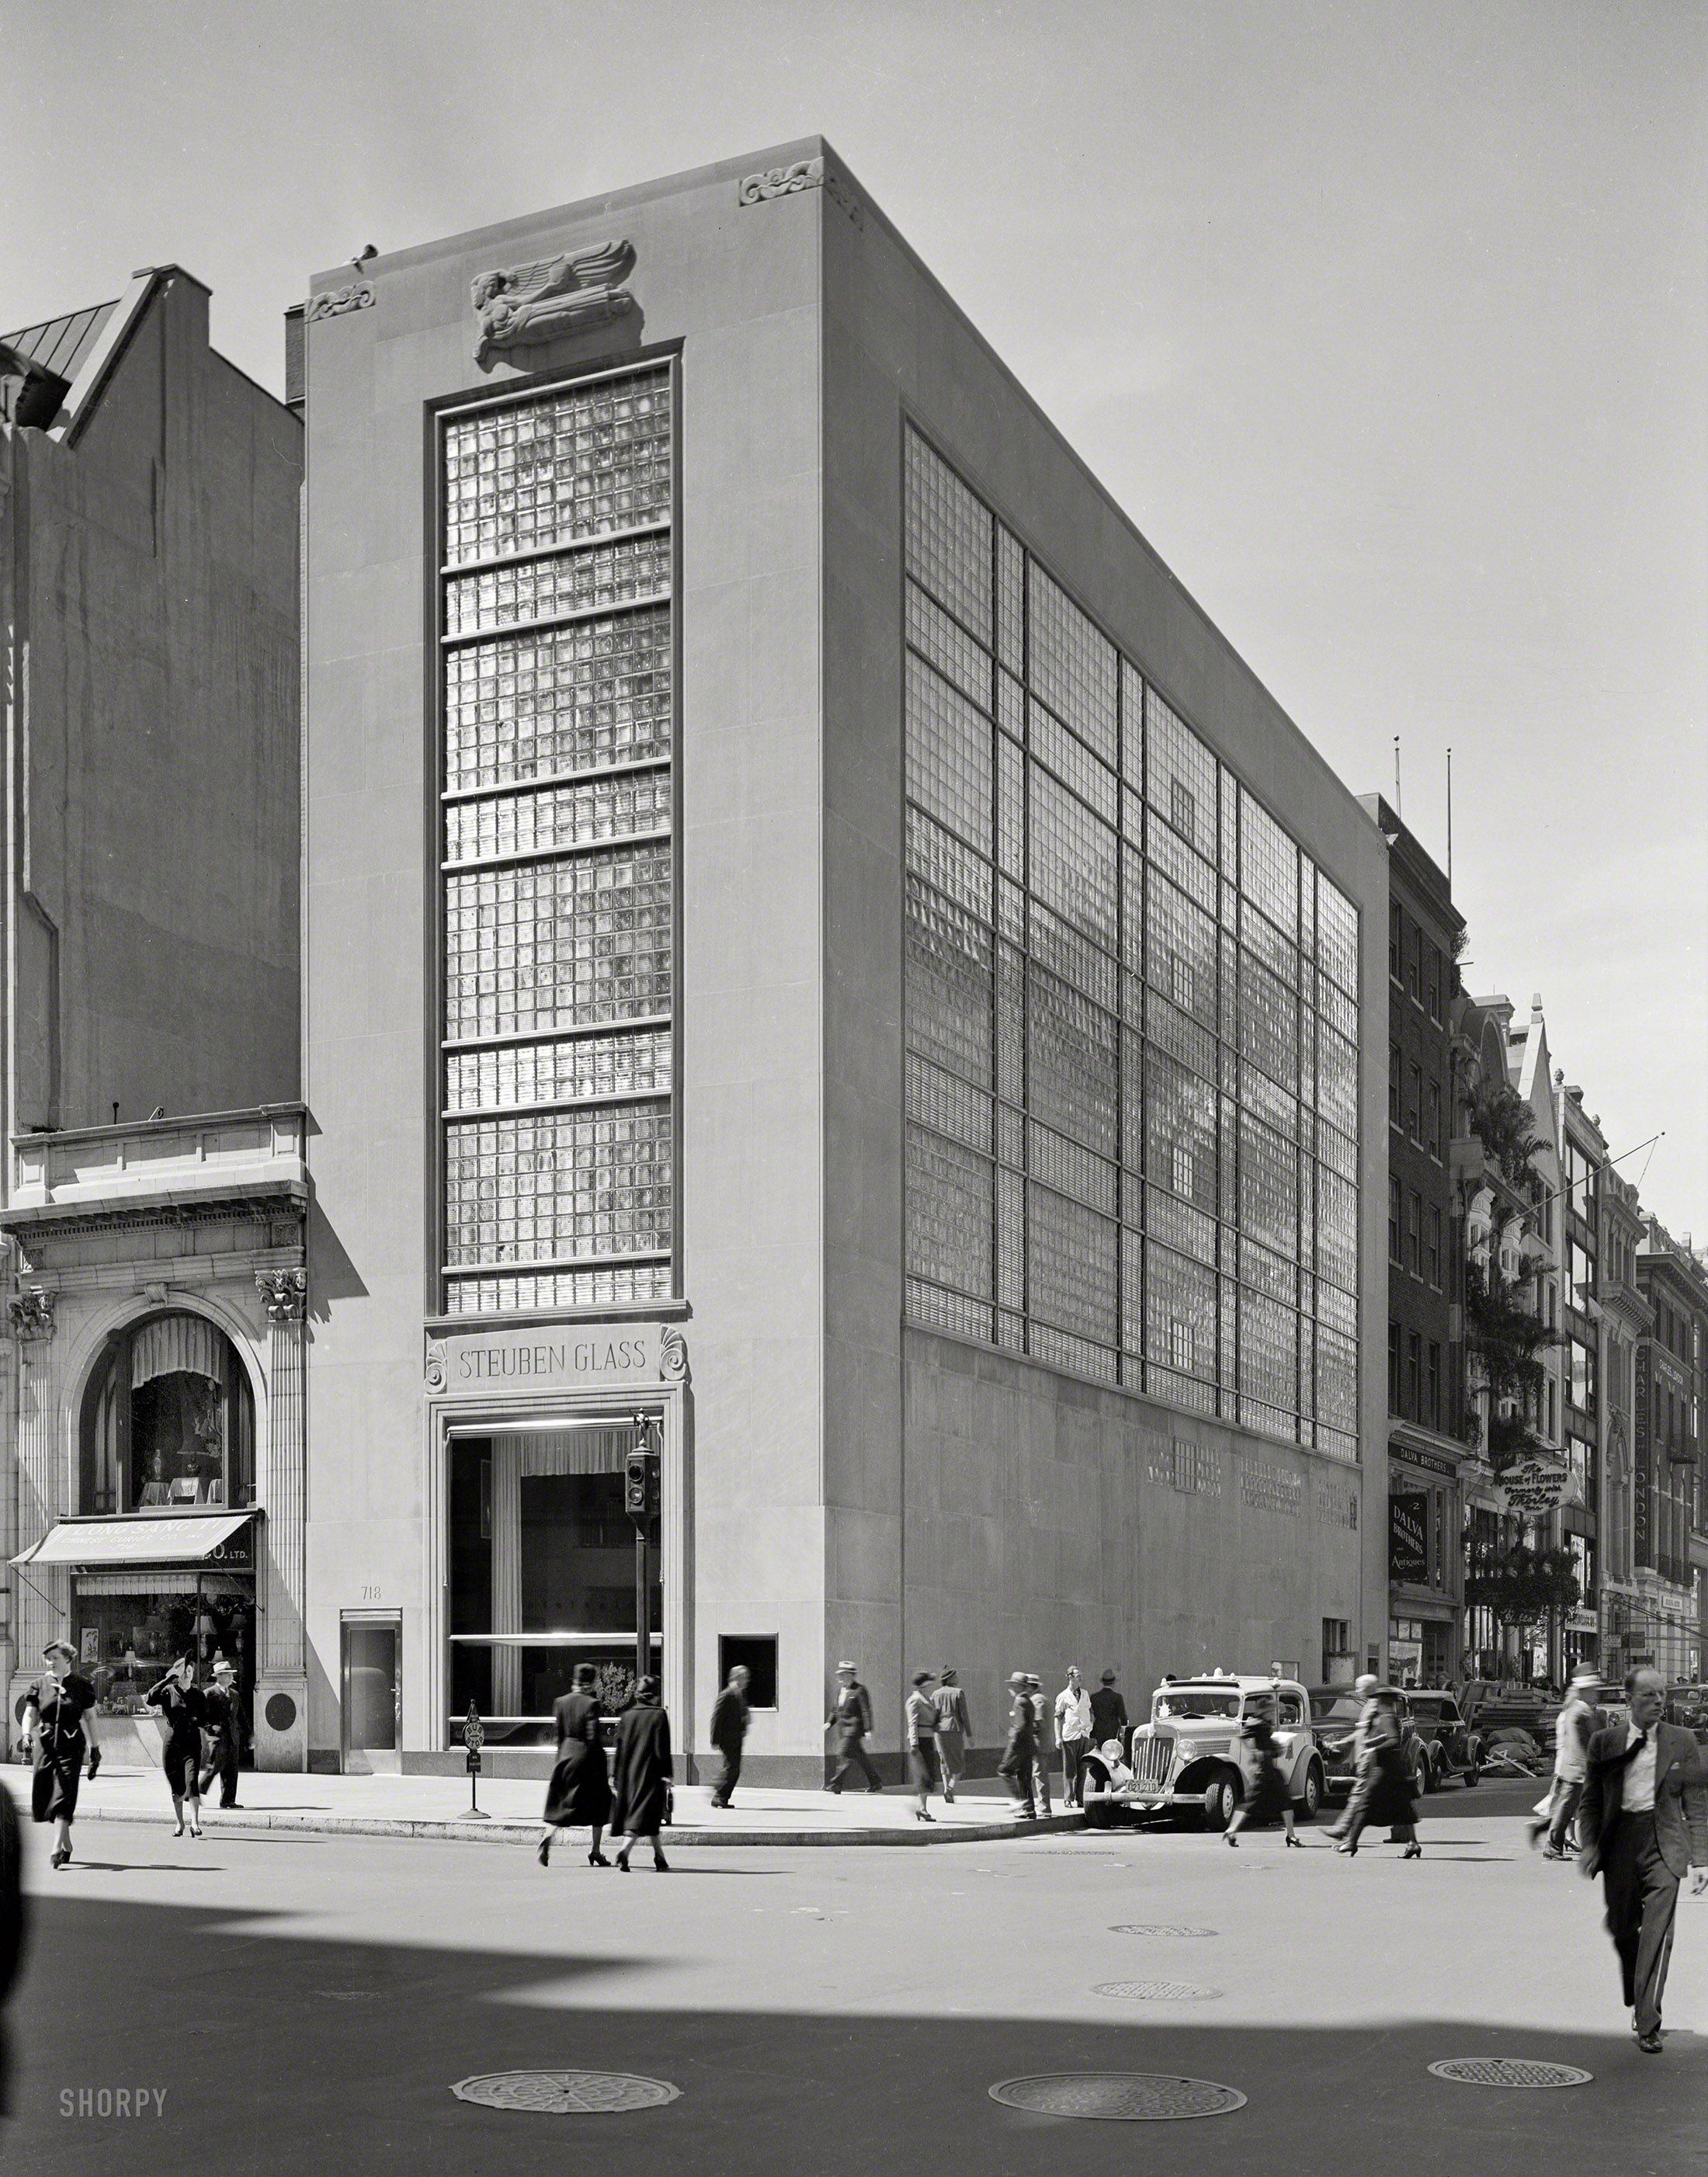 Shorpy historical photo archive steuben glass 1937